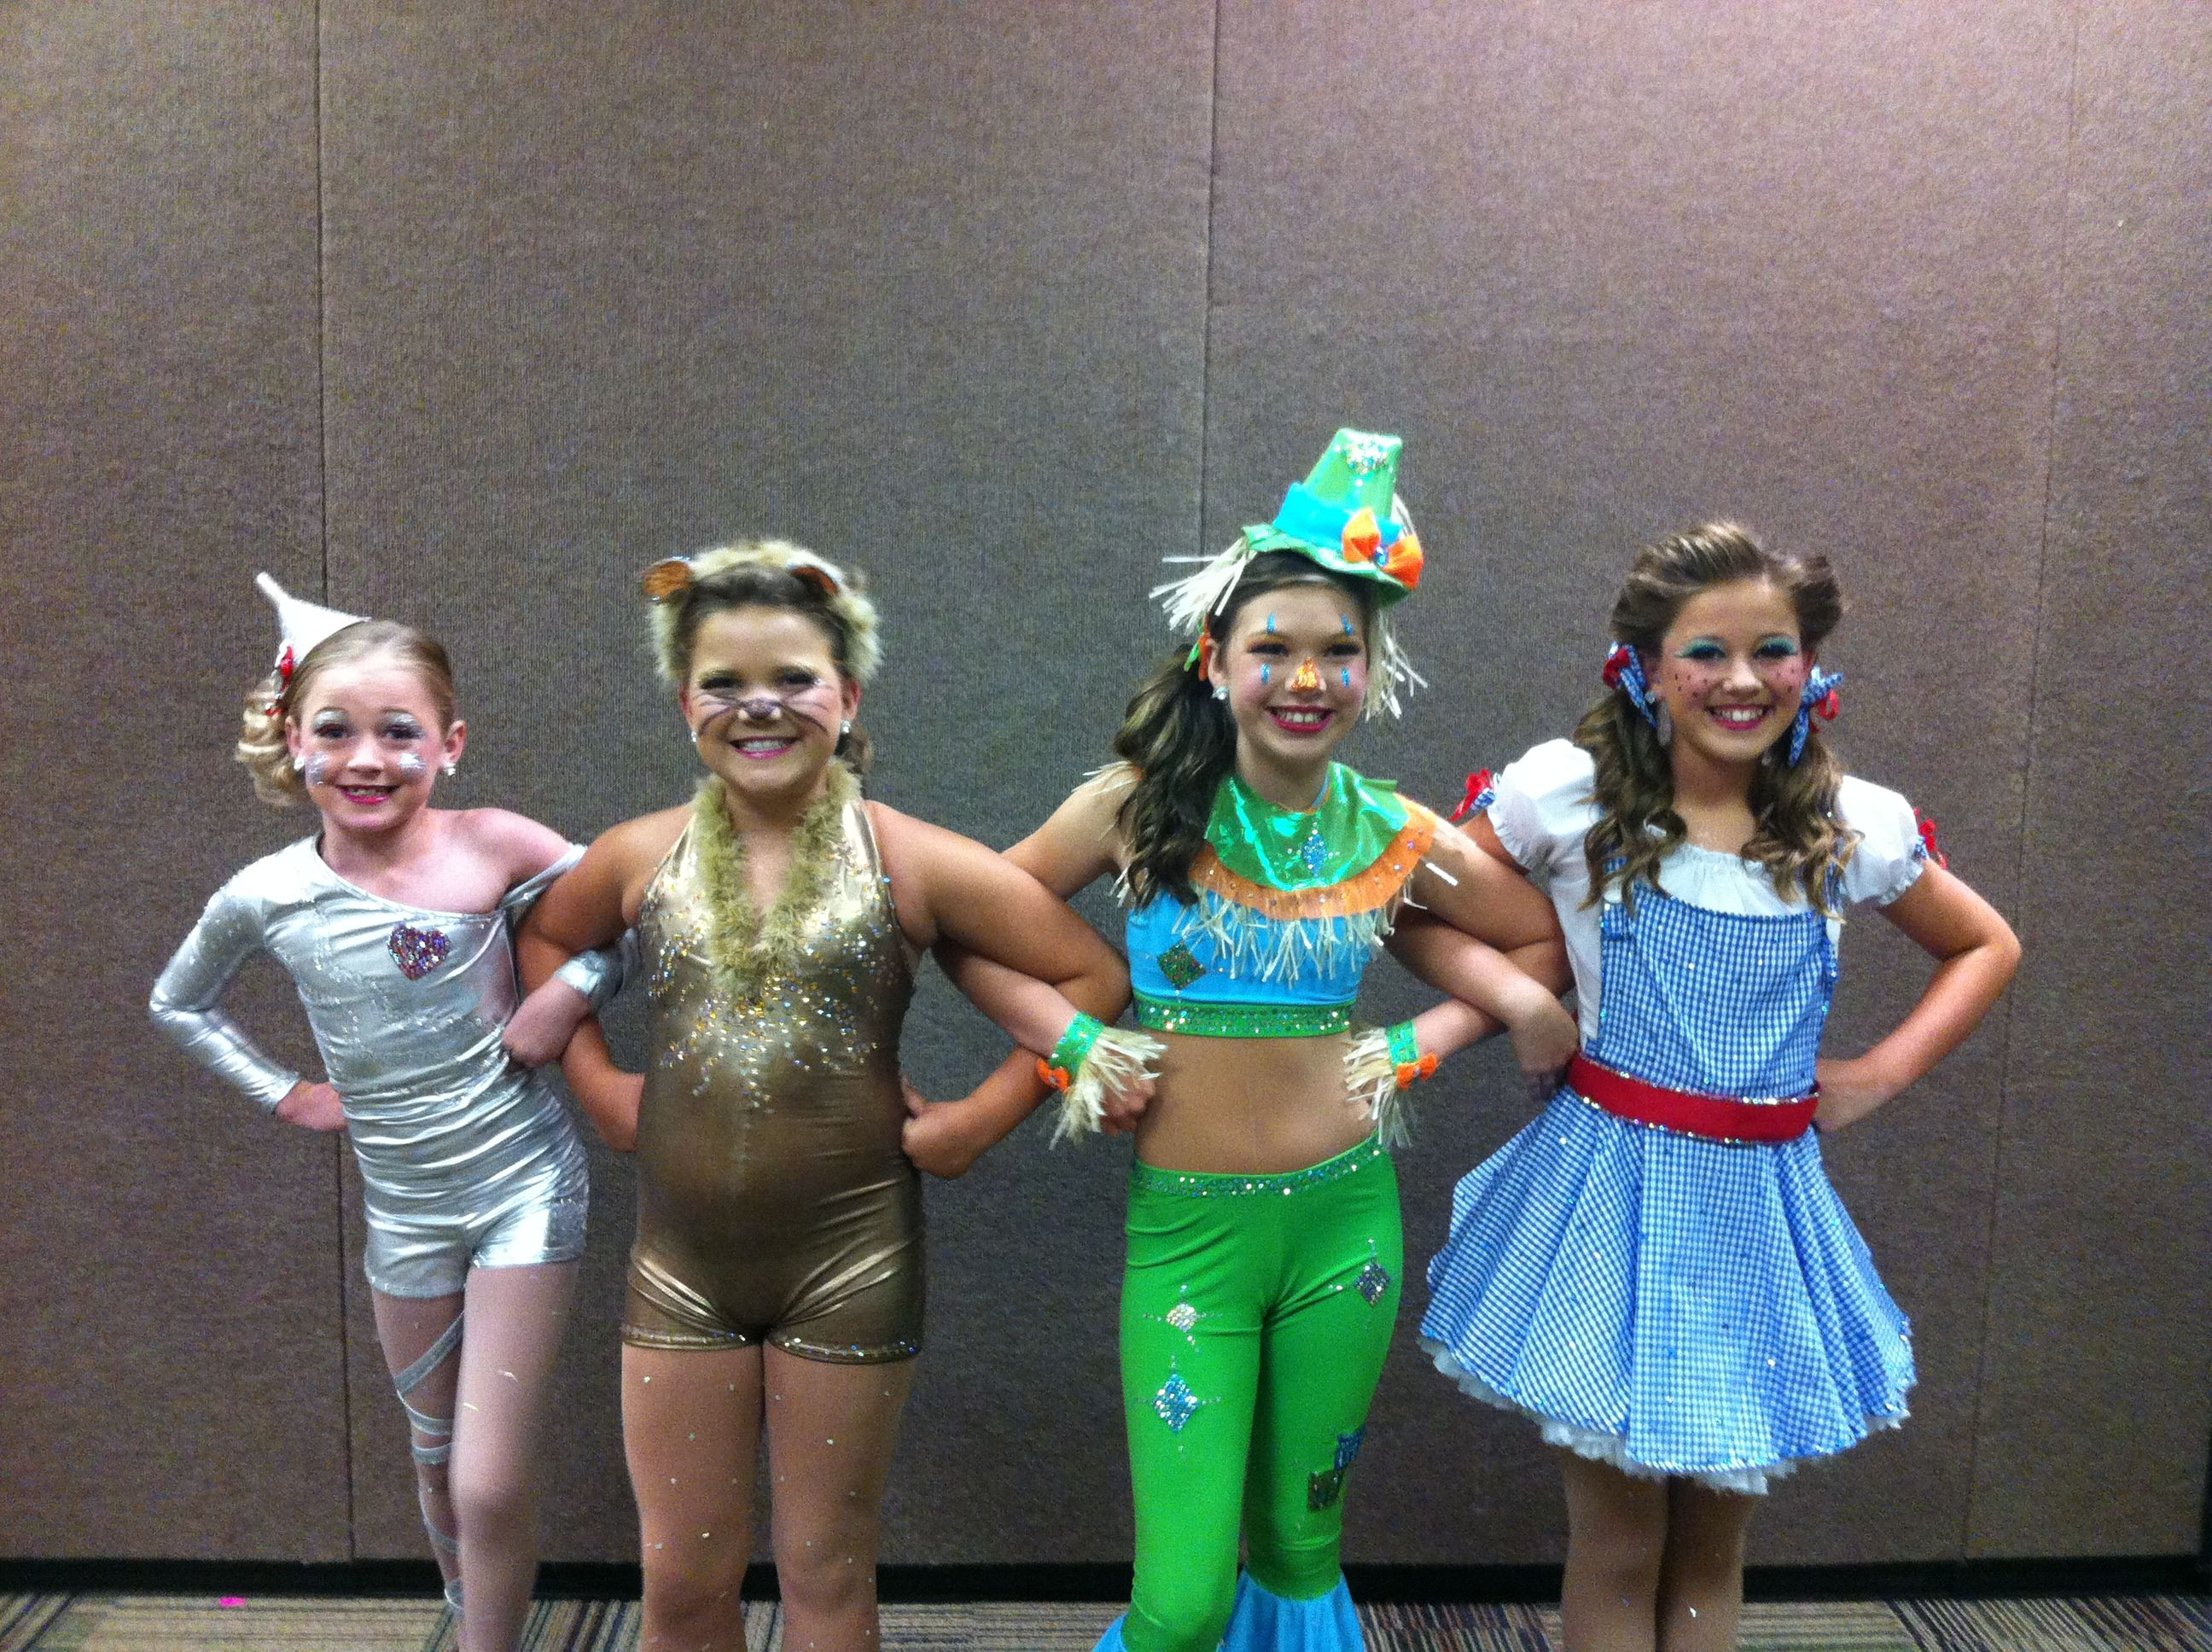 Dance costume girls wizard of oz | Dance | Pinterest | Dance ...